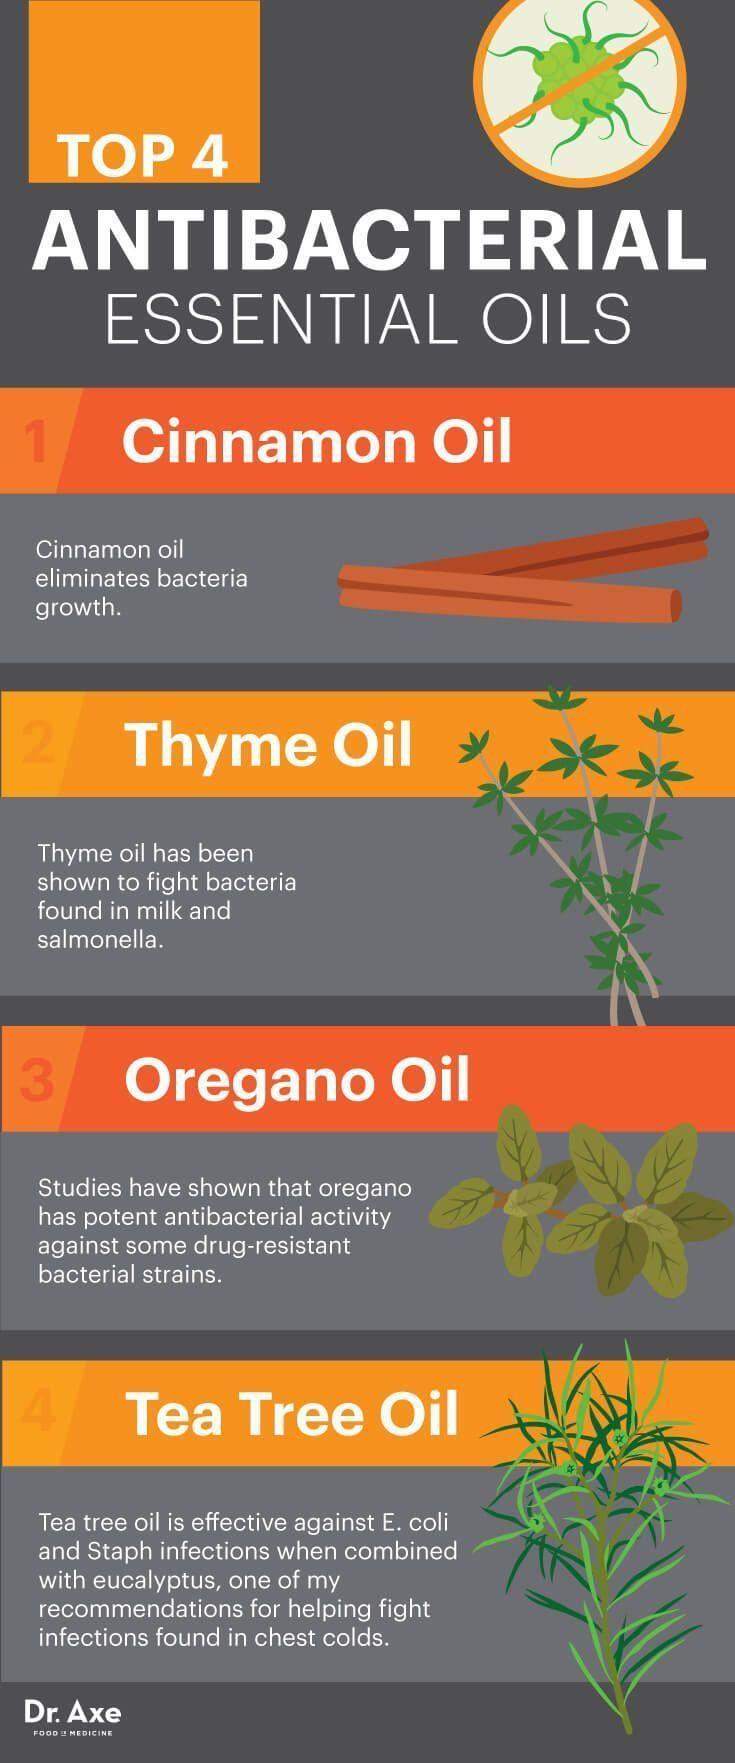 Top four antibacterial #essentialoils - Dr. Axe : #wonderfulscents #aromatherapy https://wonderfulscents.com/